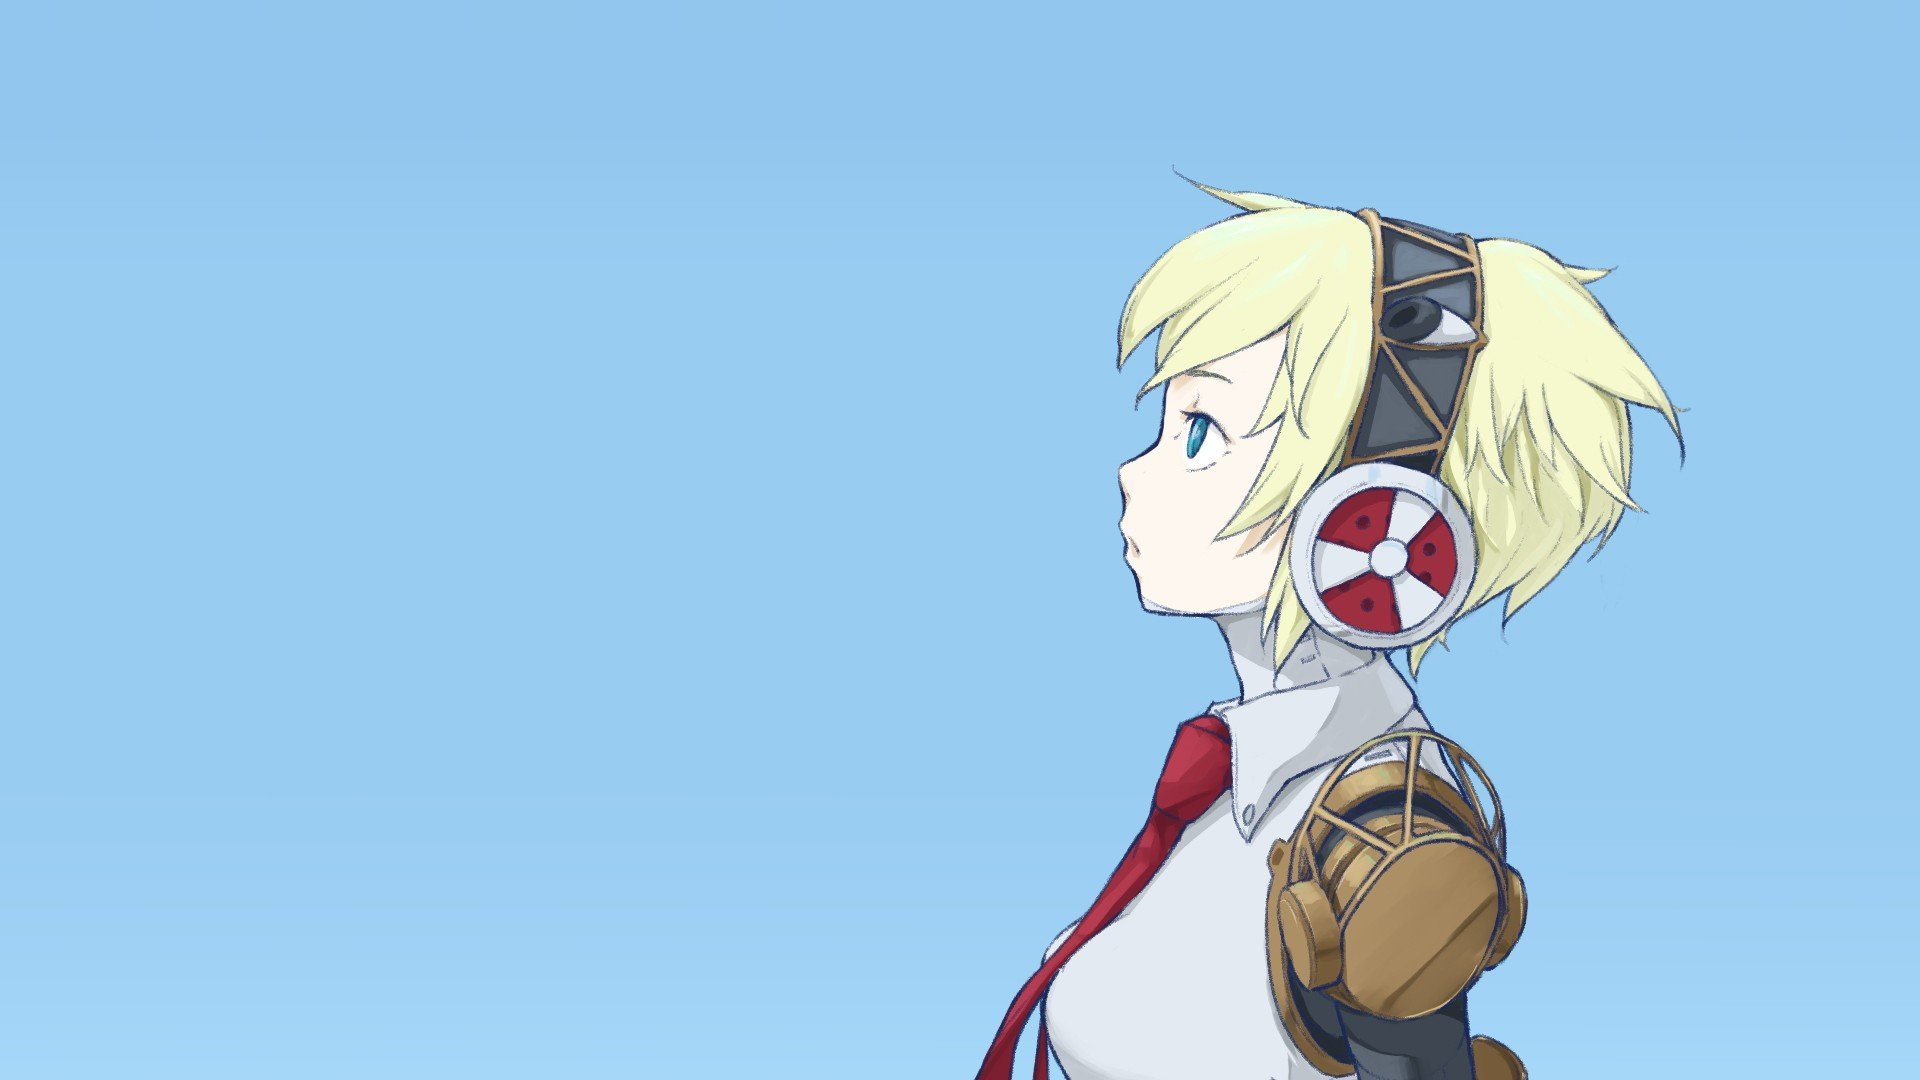 Persona 3 fes dating aigis mechtronics. Persona 3 fes dating aigis mechtronics.